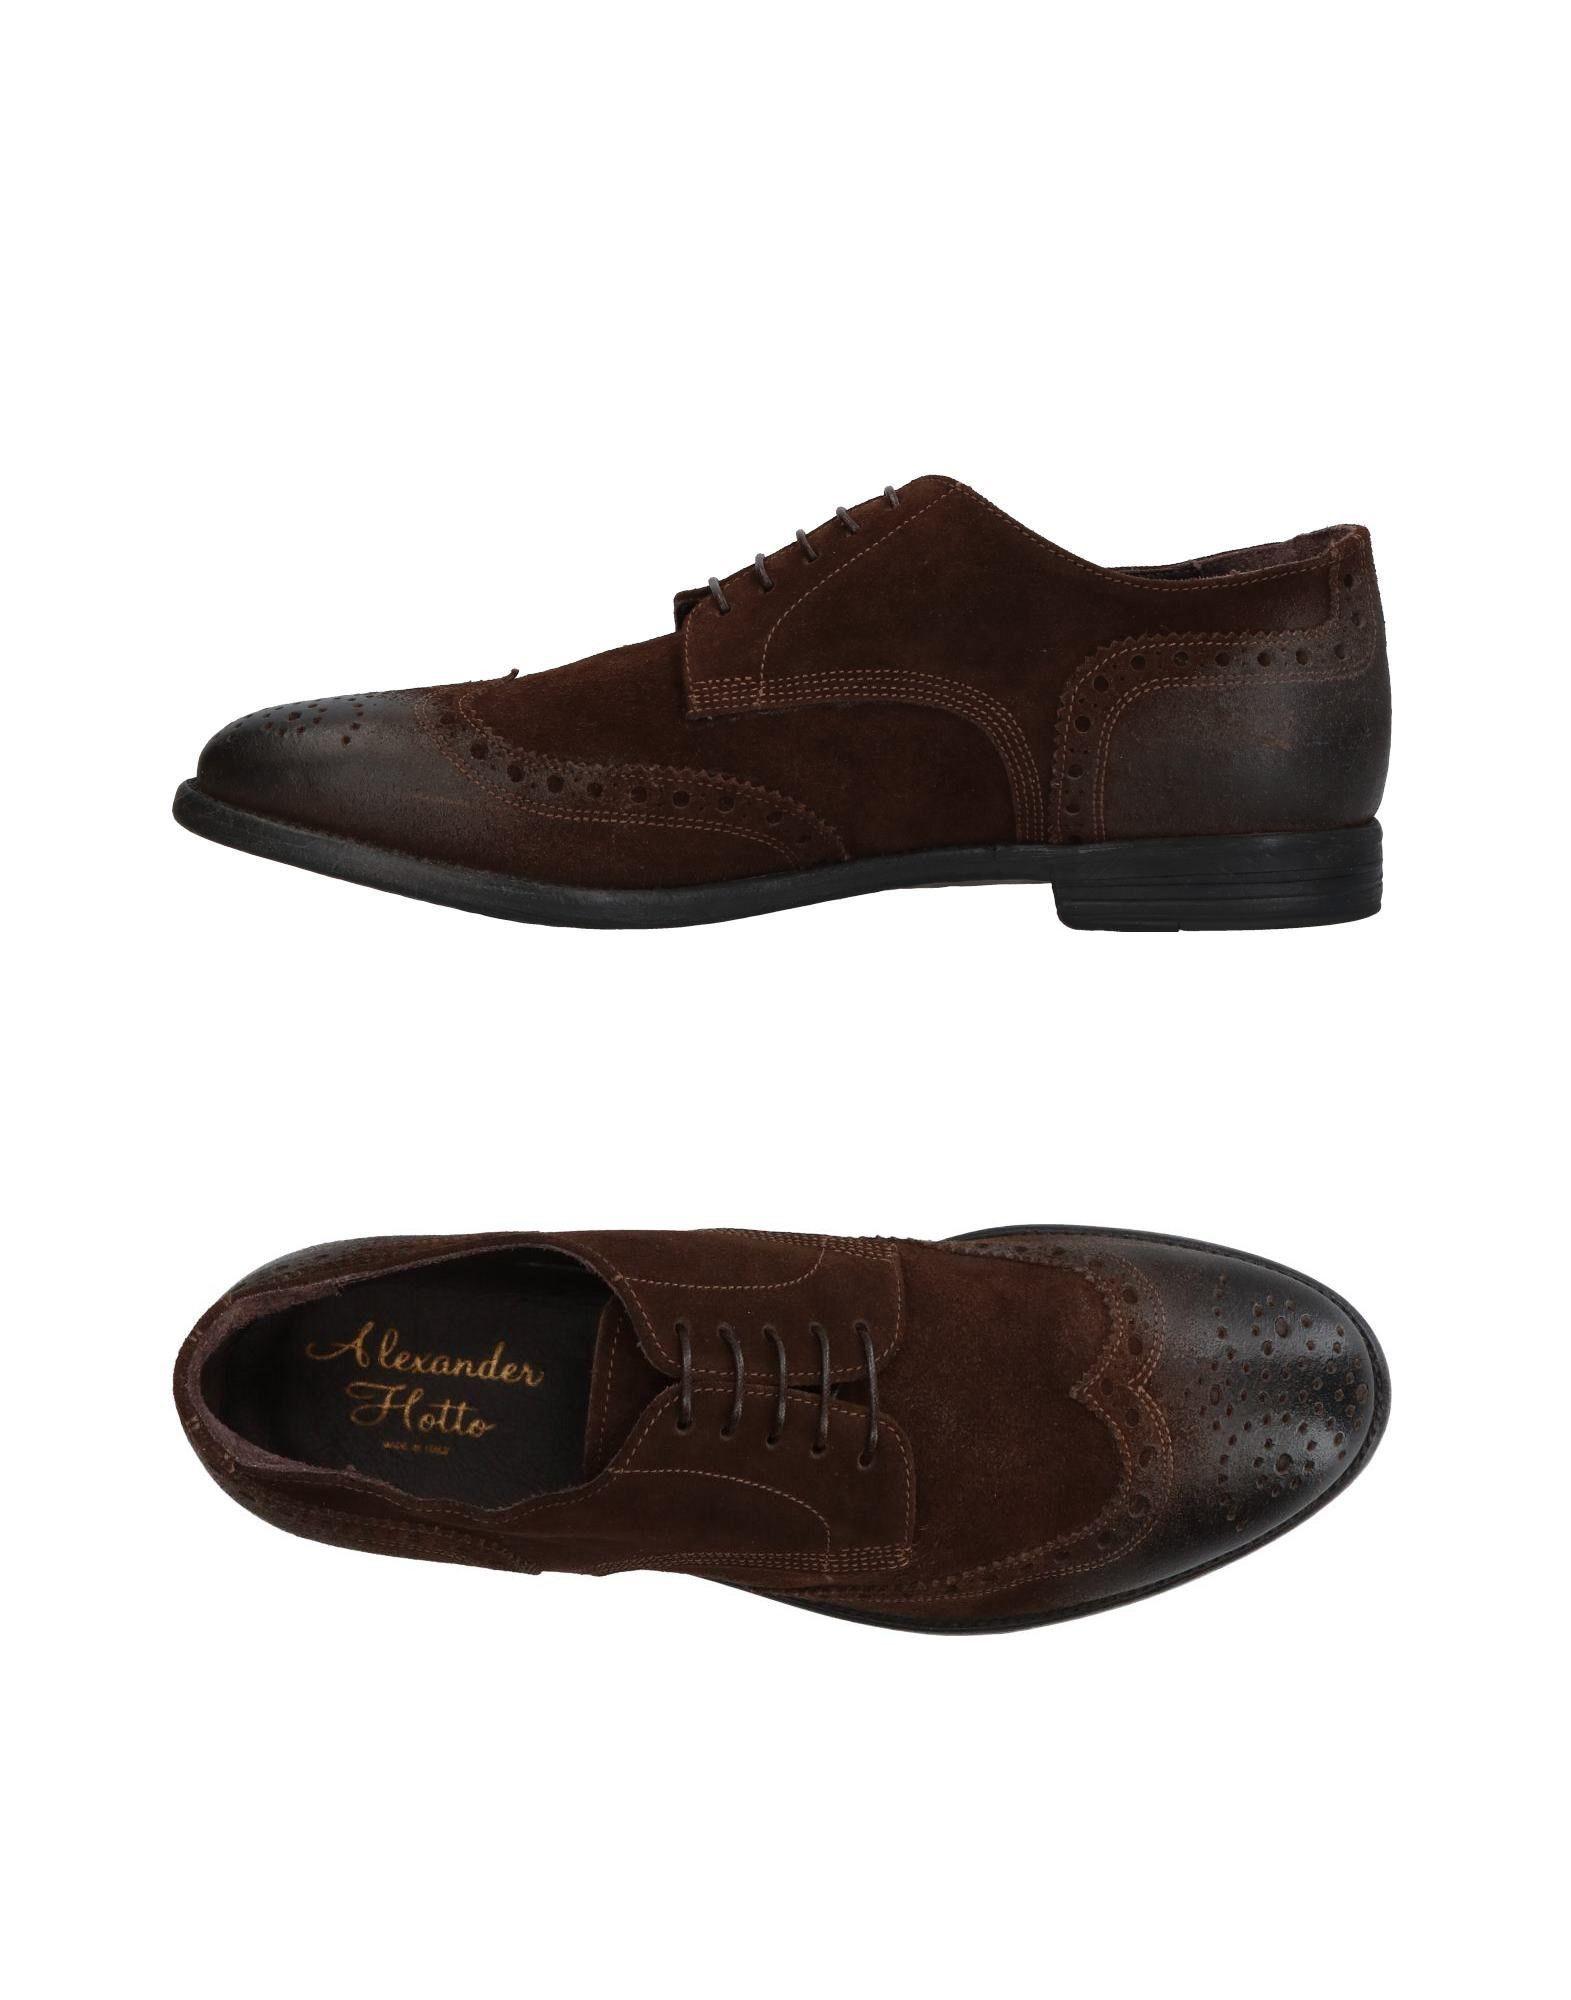 ALEXANDER HOTTO Обувь на шнурках alexander hotto оригинальные кожаные кроссовки бренда alexander hotto